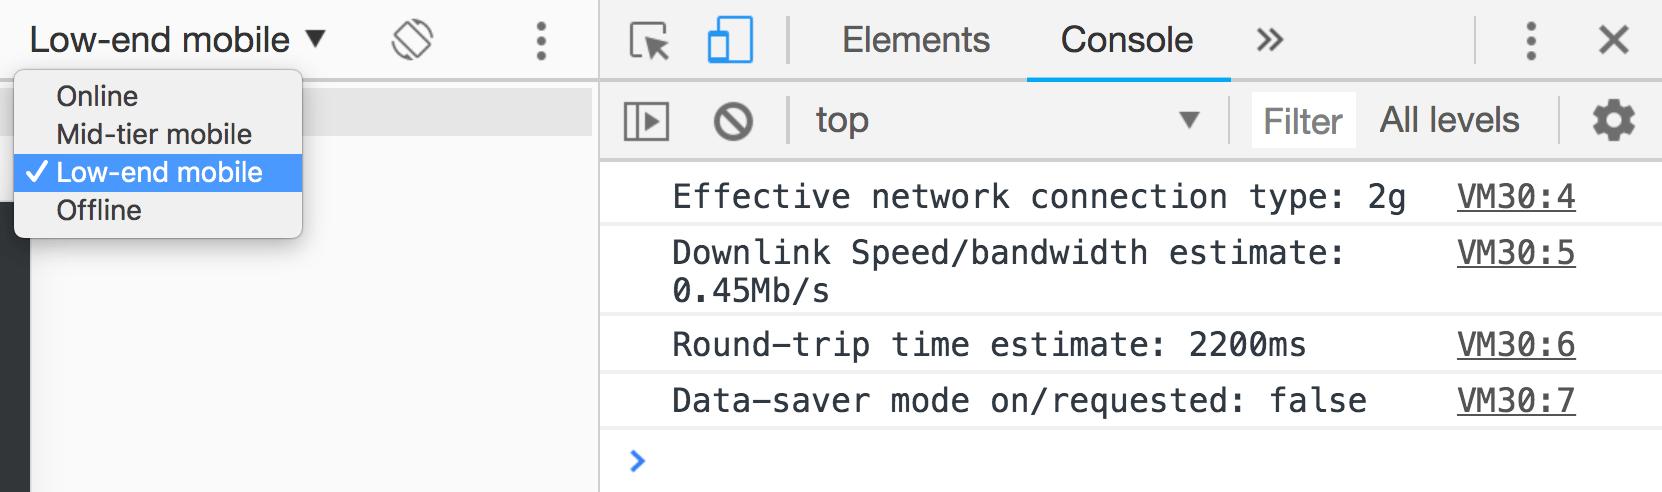 AddyOsmani.com   Adaptive Serving using JavaScript and the Network ...